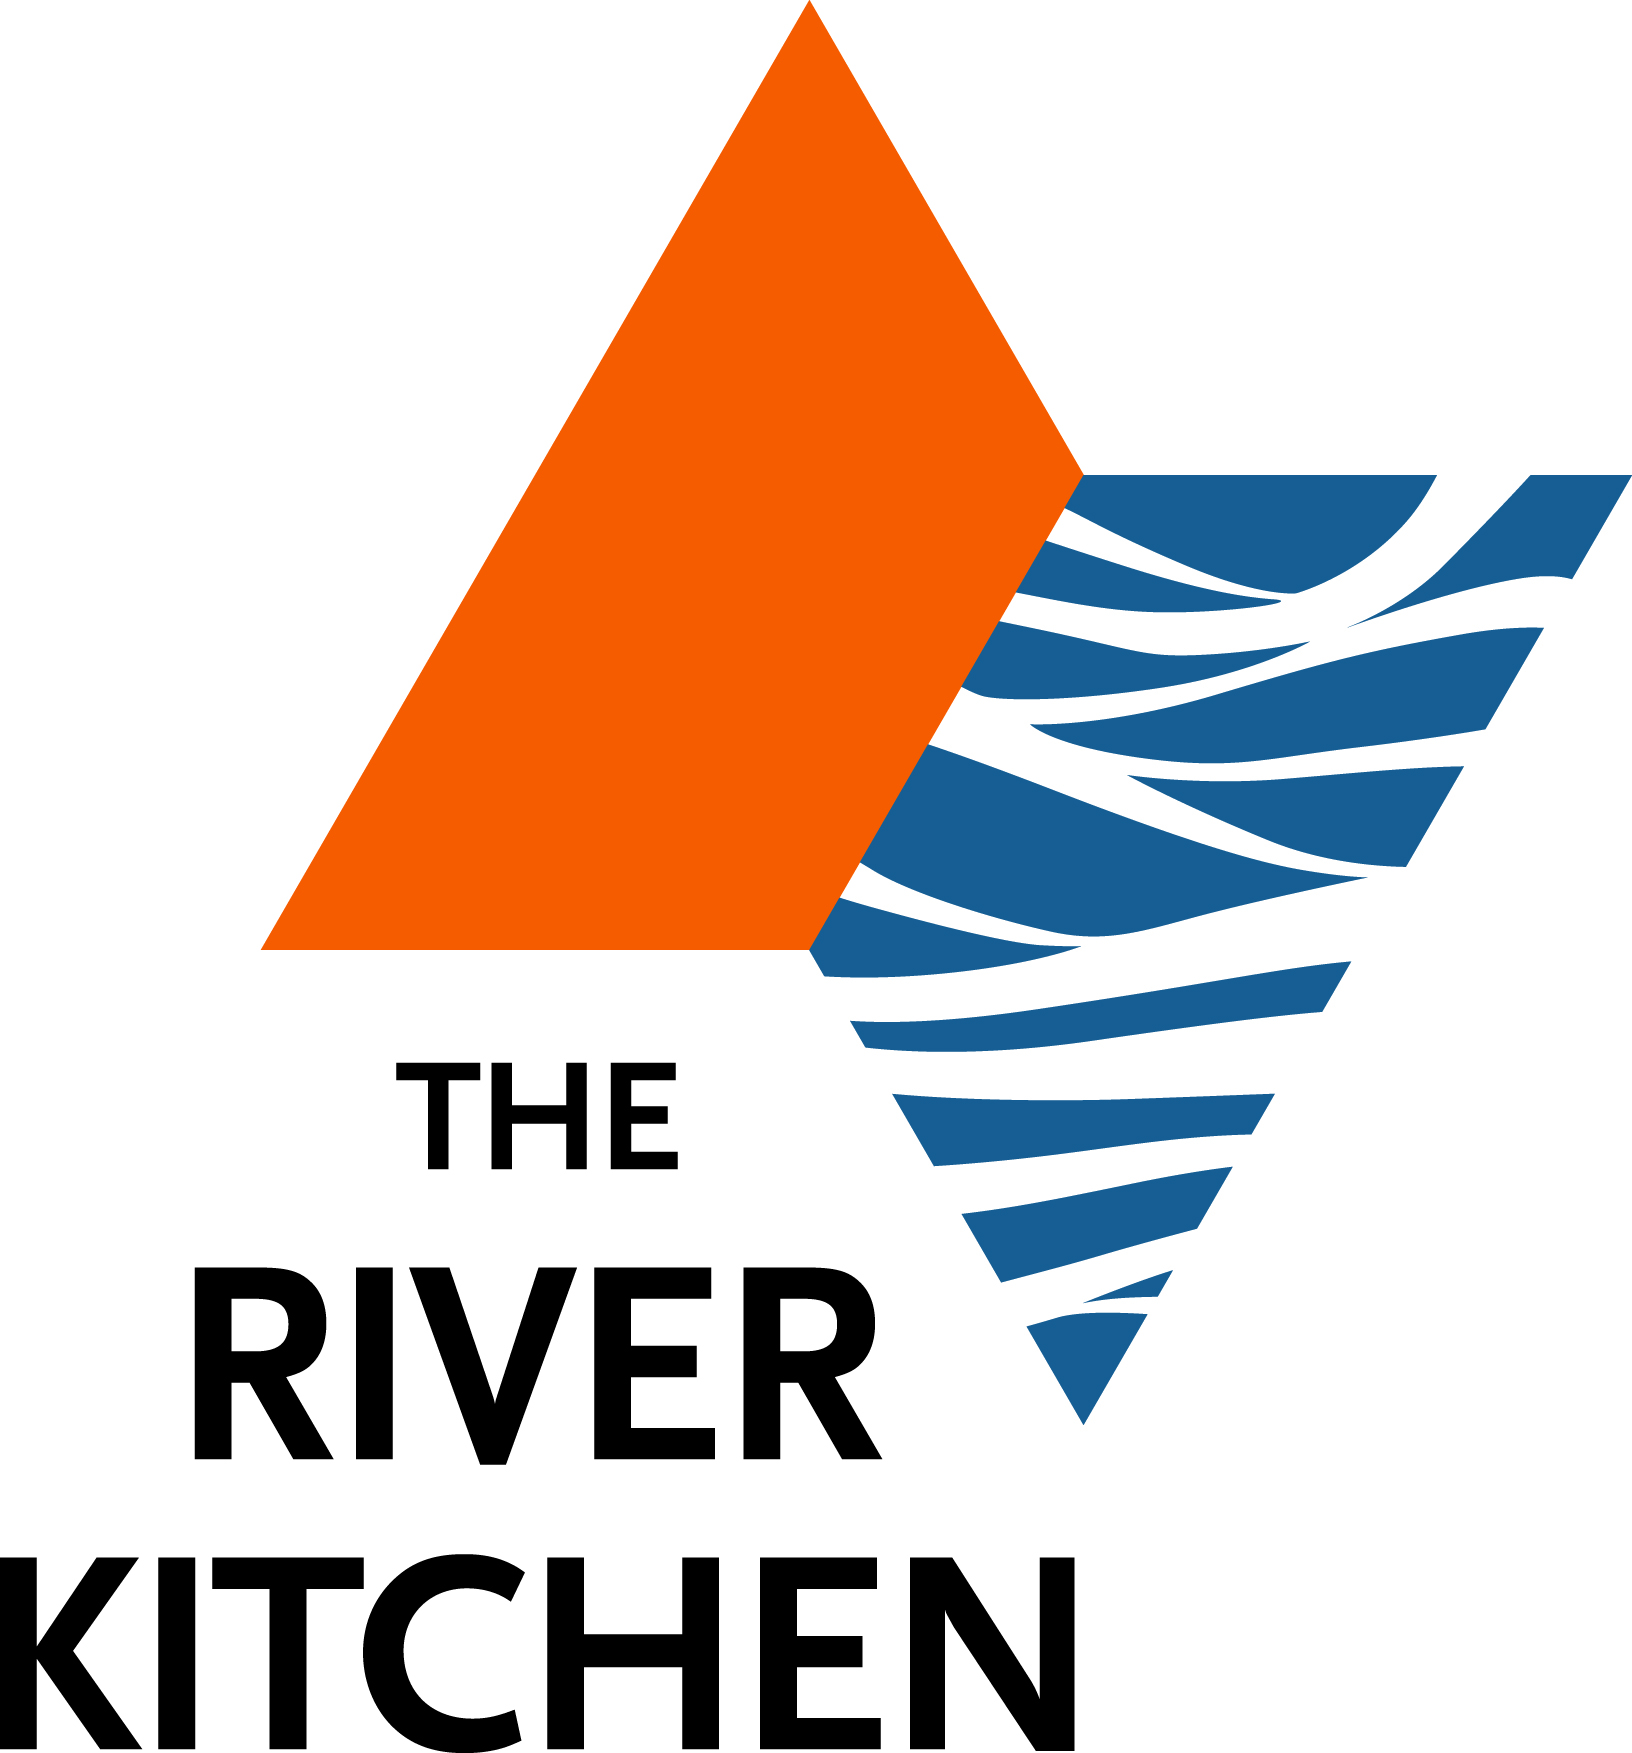 The River Kitchen